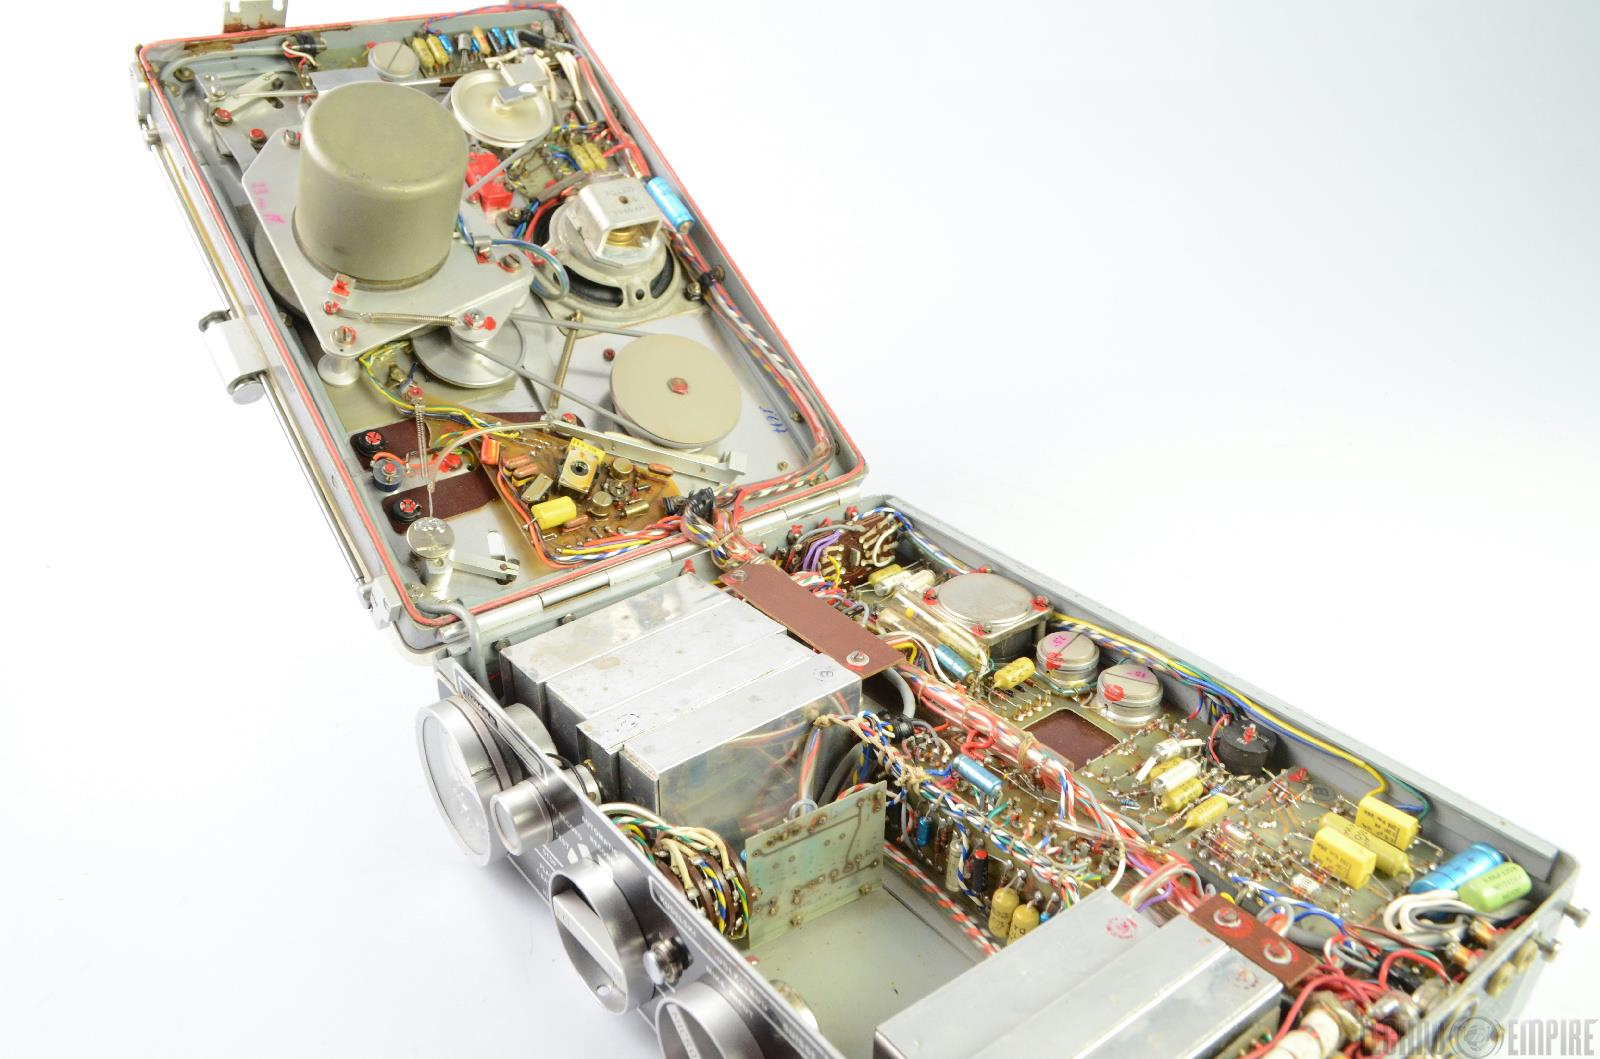 Kudelski nagra iii portable reel to reel tape recorder